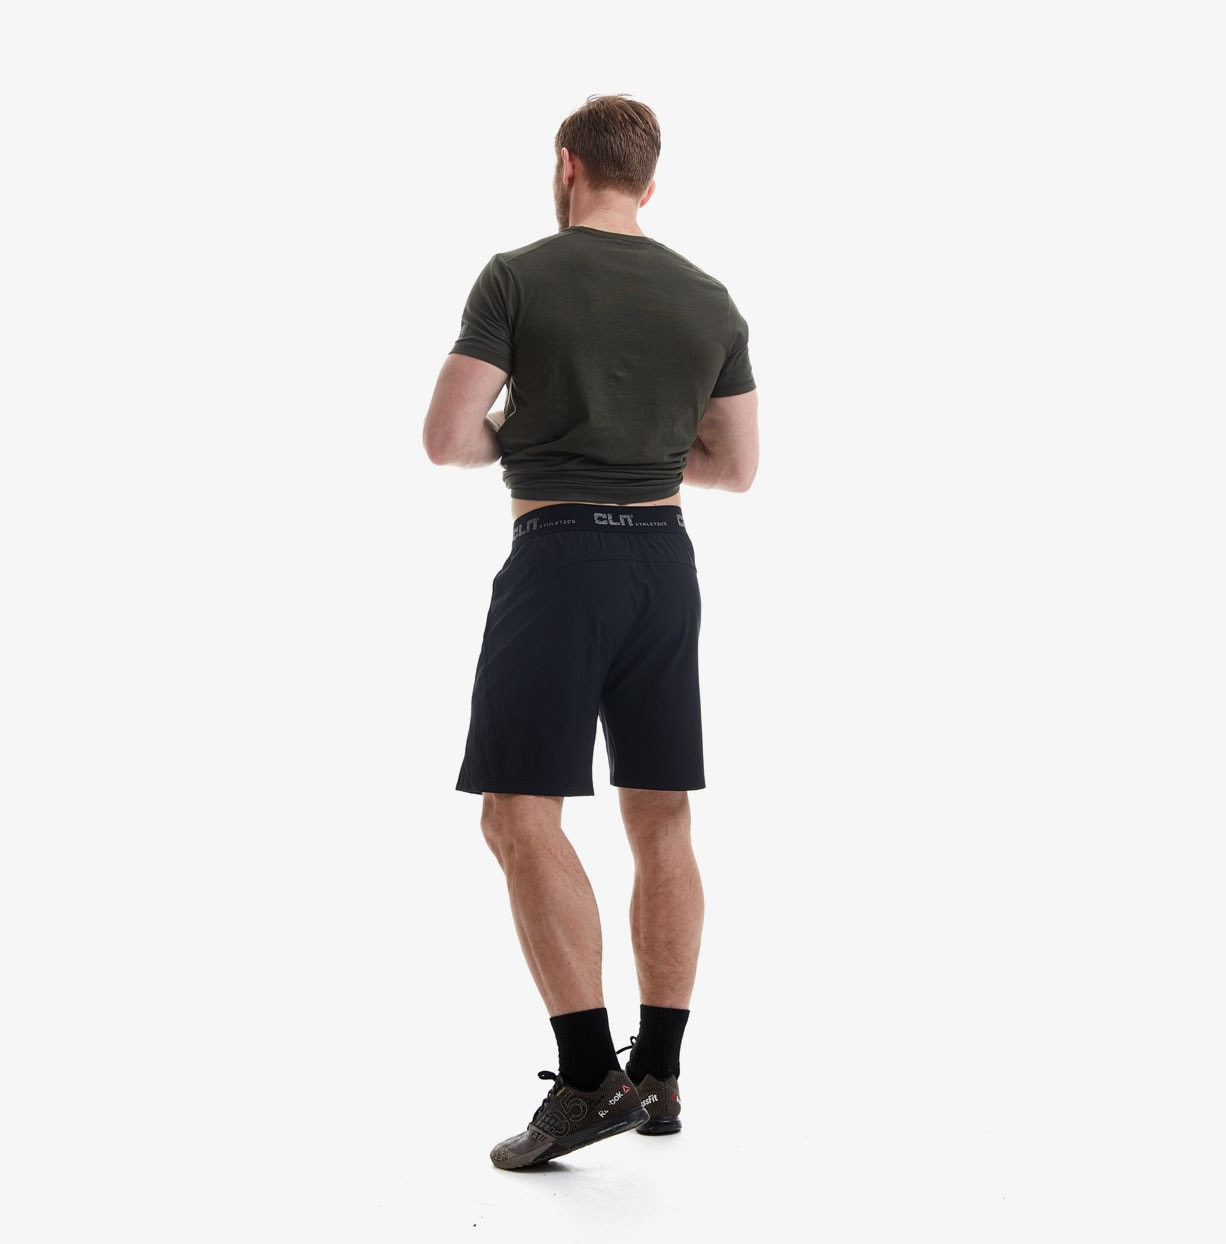 CLN-Injection-Shorts-Black-4